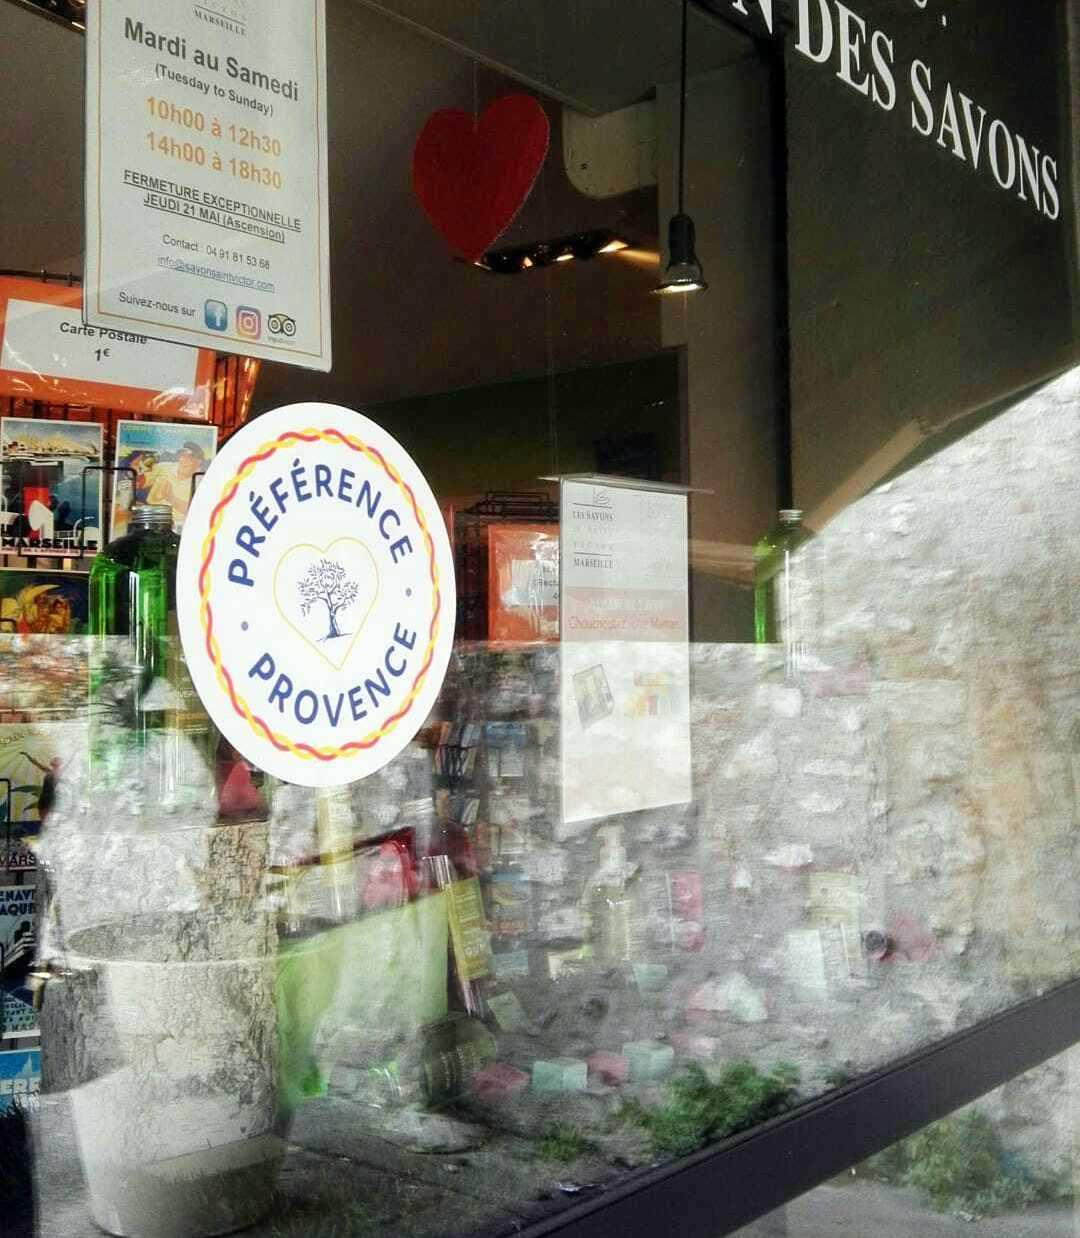 , Préférence Provence : le nouveau label pour booster tourisme et consommation locale, Made in Marseille, Made in Marseille